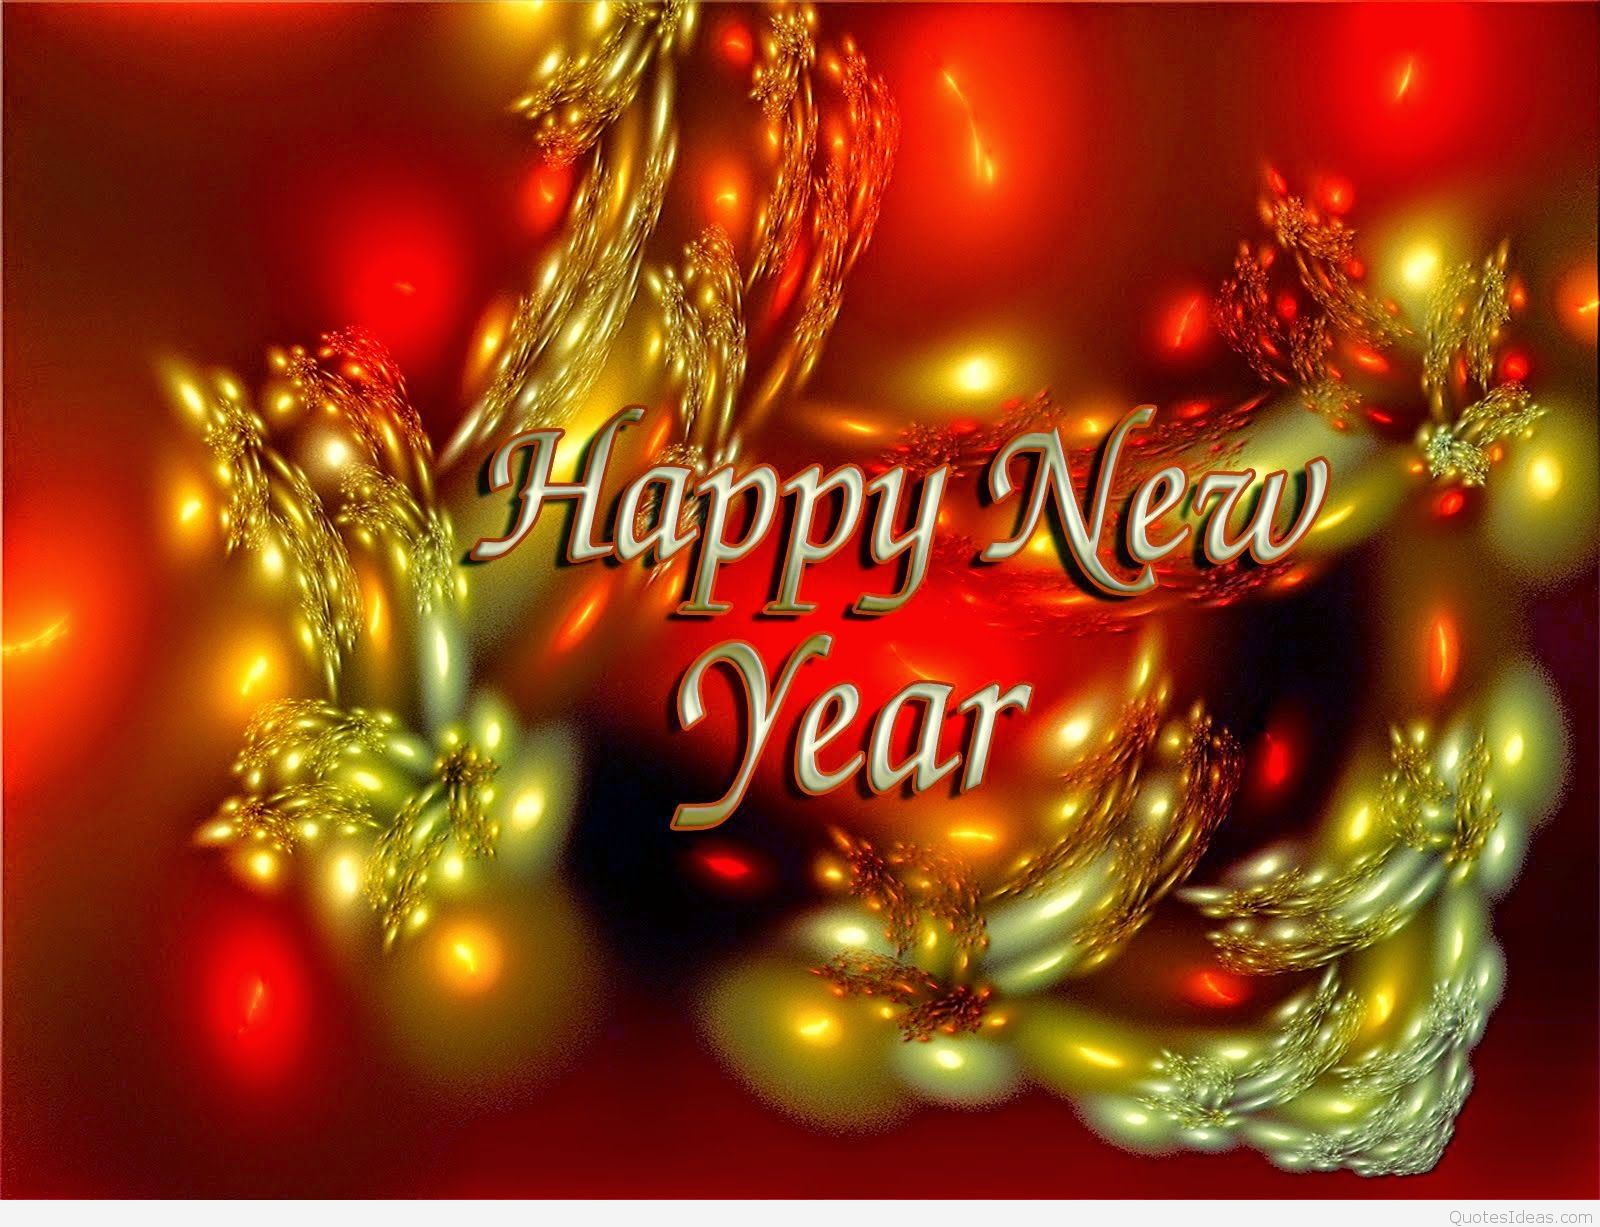 Happy New Year Wallpaper Background Hd - Happy New Year Greeting Card 2020 , HD Wallpaper & Backgrounds